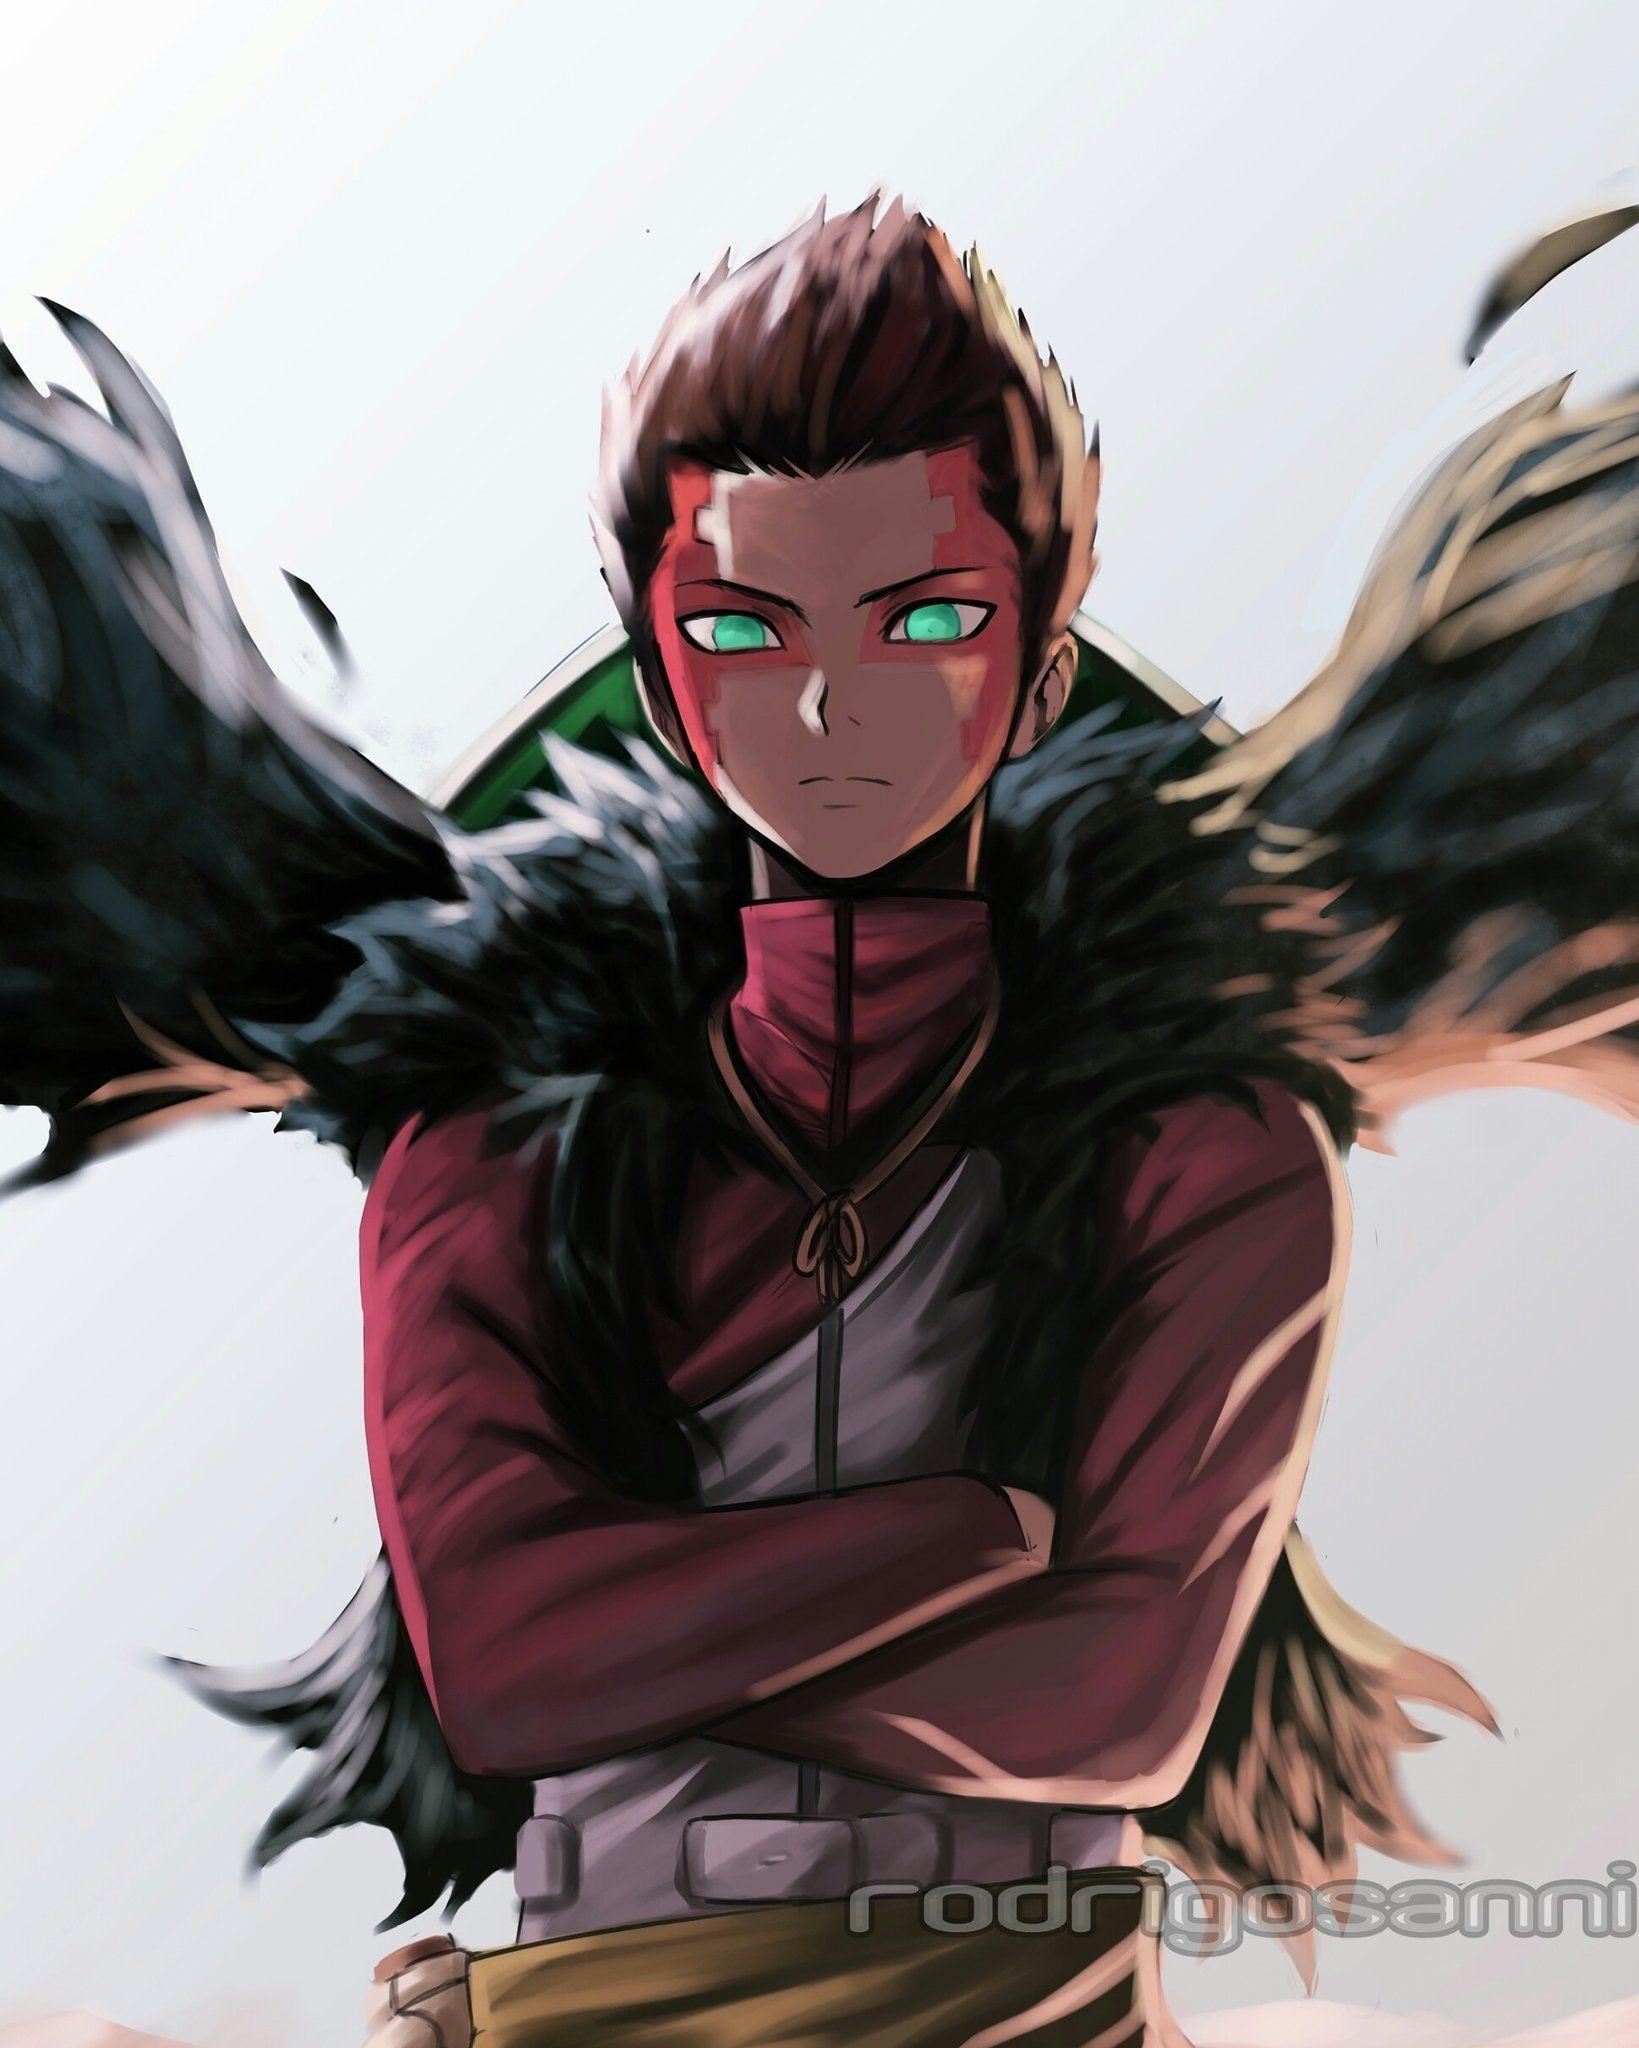 Twitter in 2020 Naruto oc characters, Boruto, Naruto